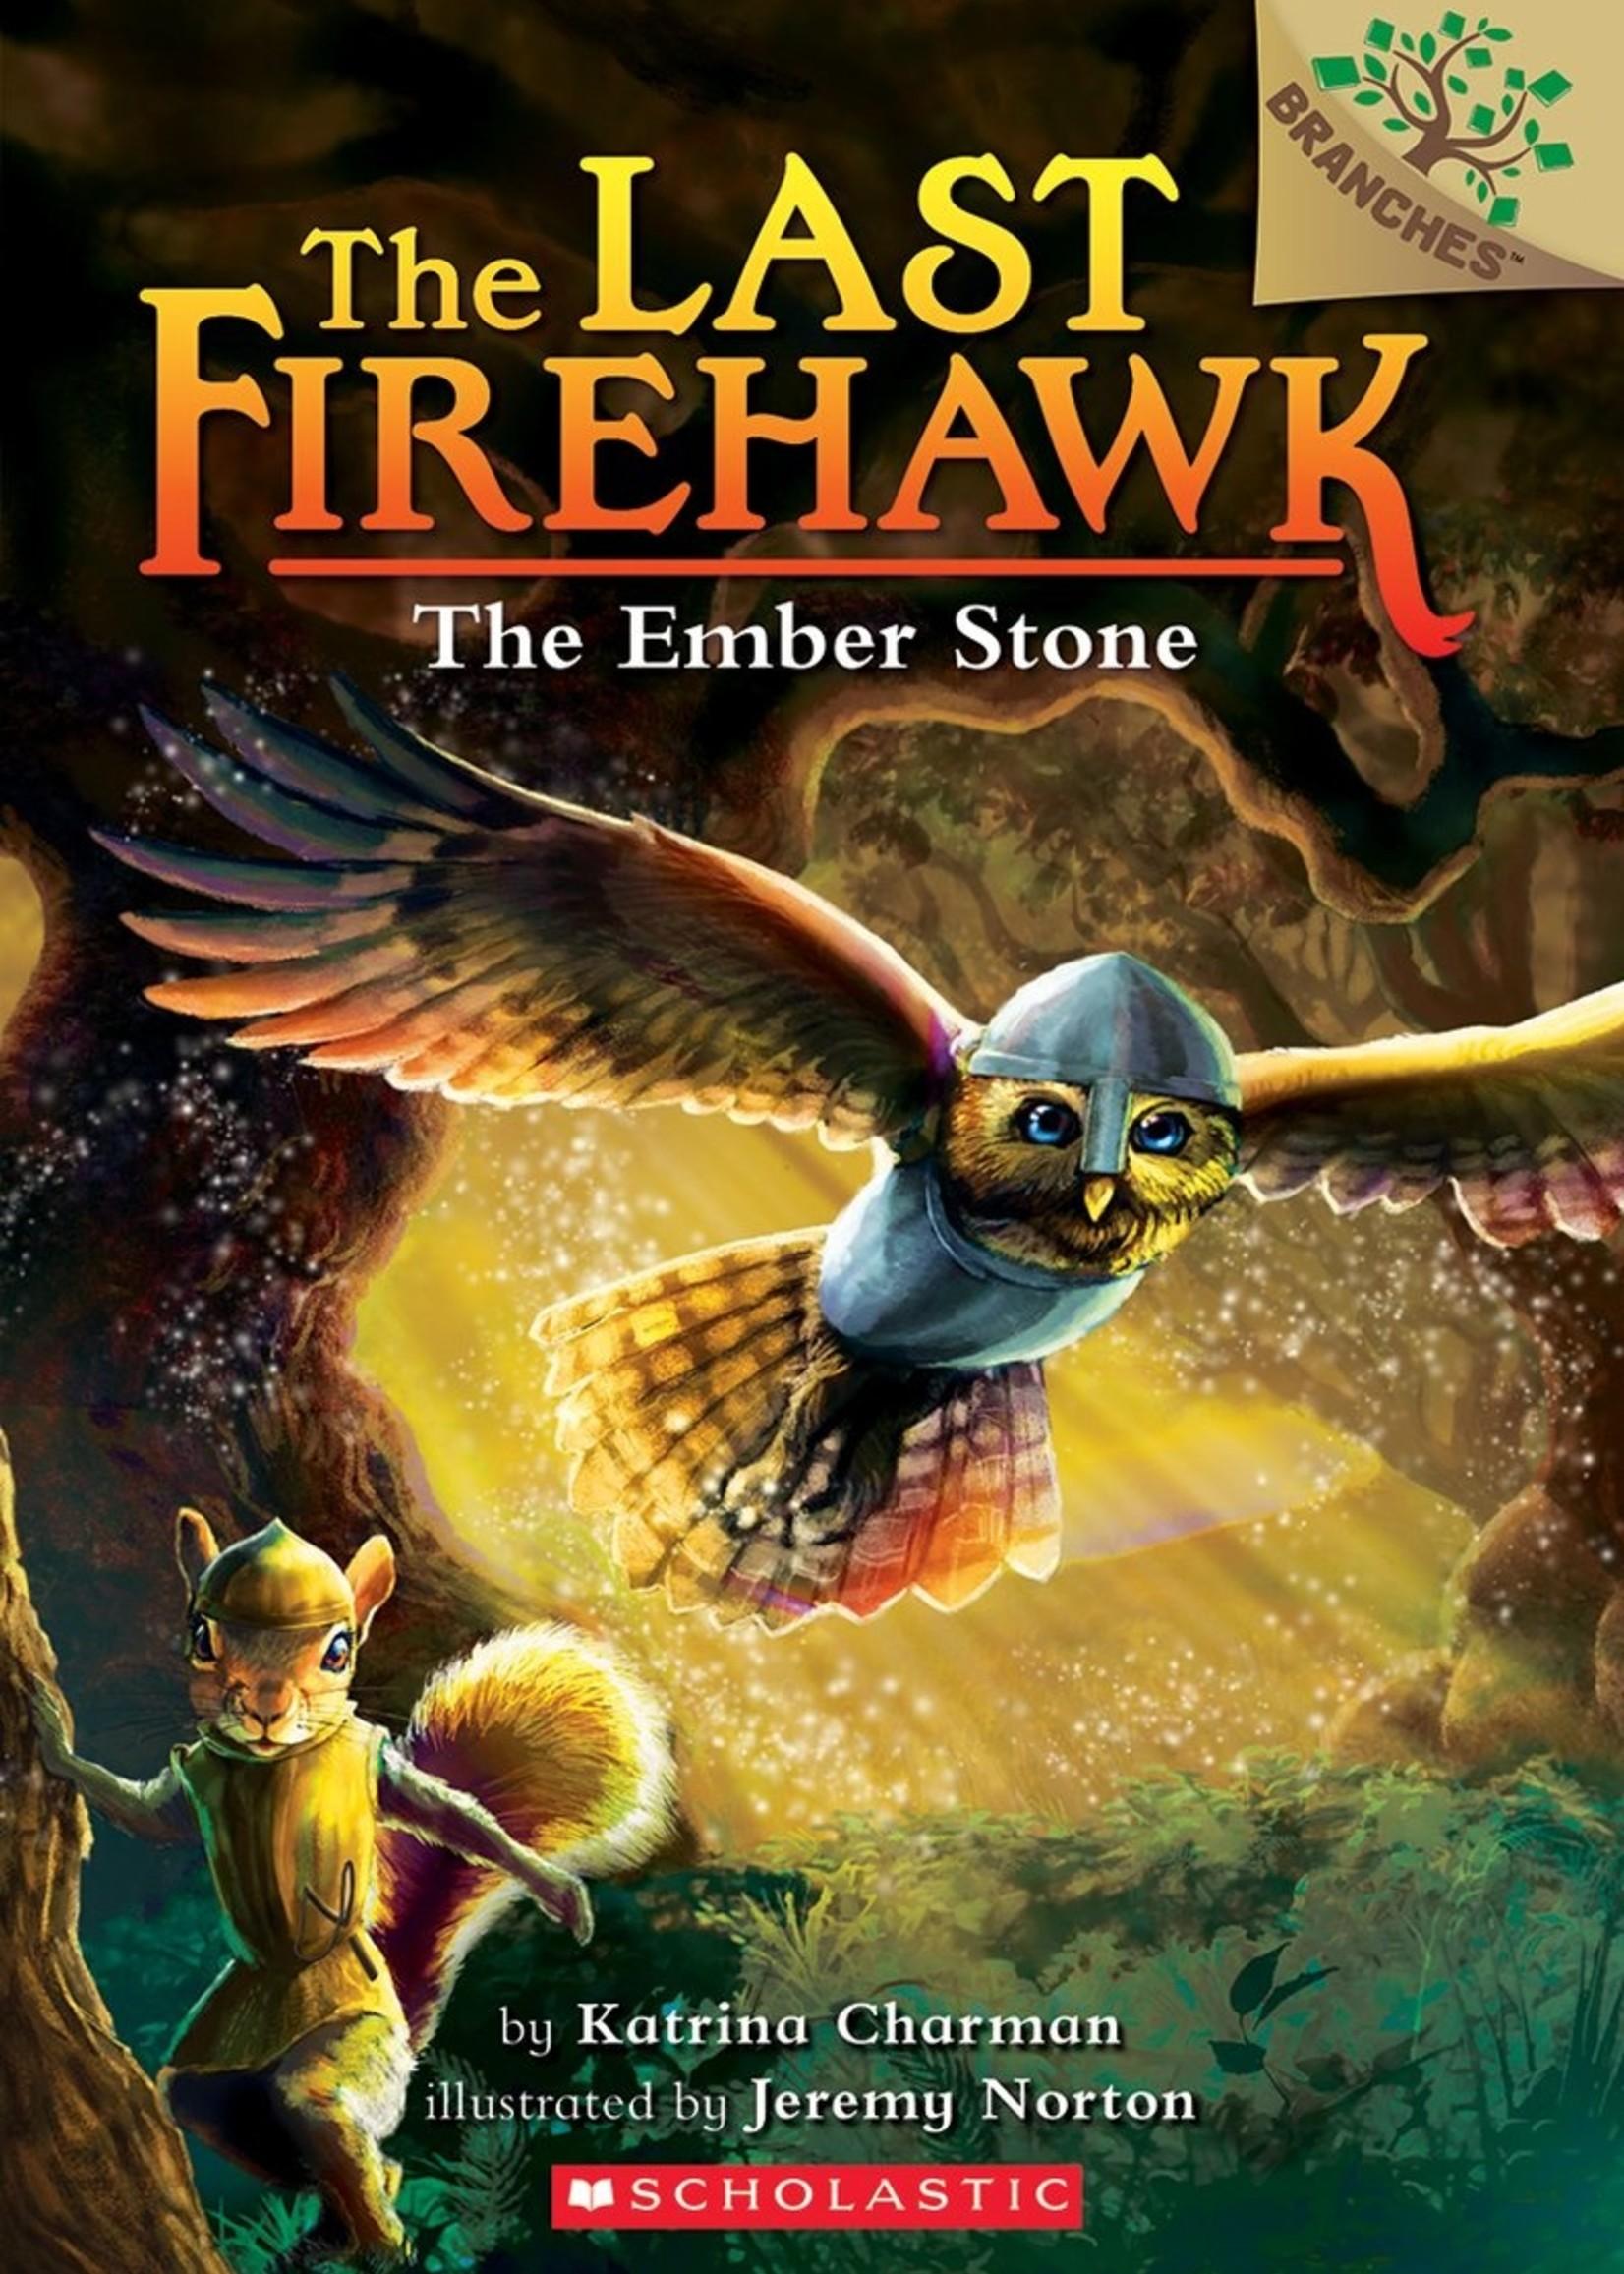 The Last Firehawk #01, The Ember Stone - Paperback